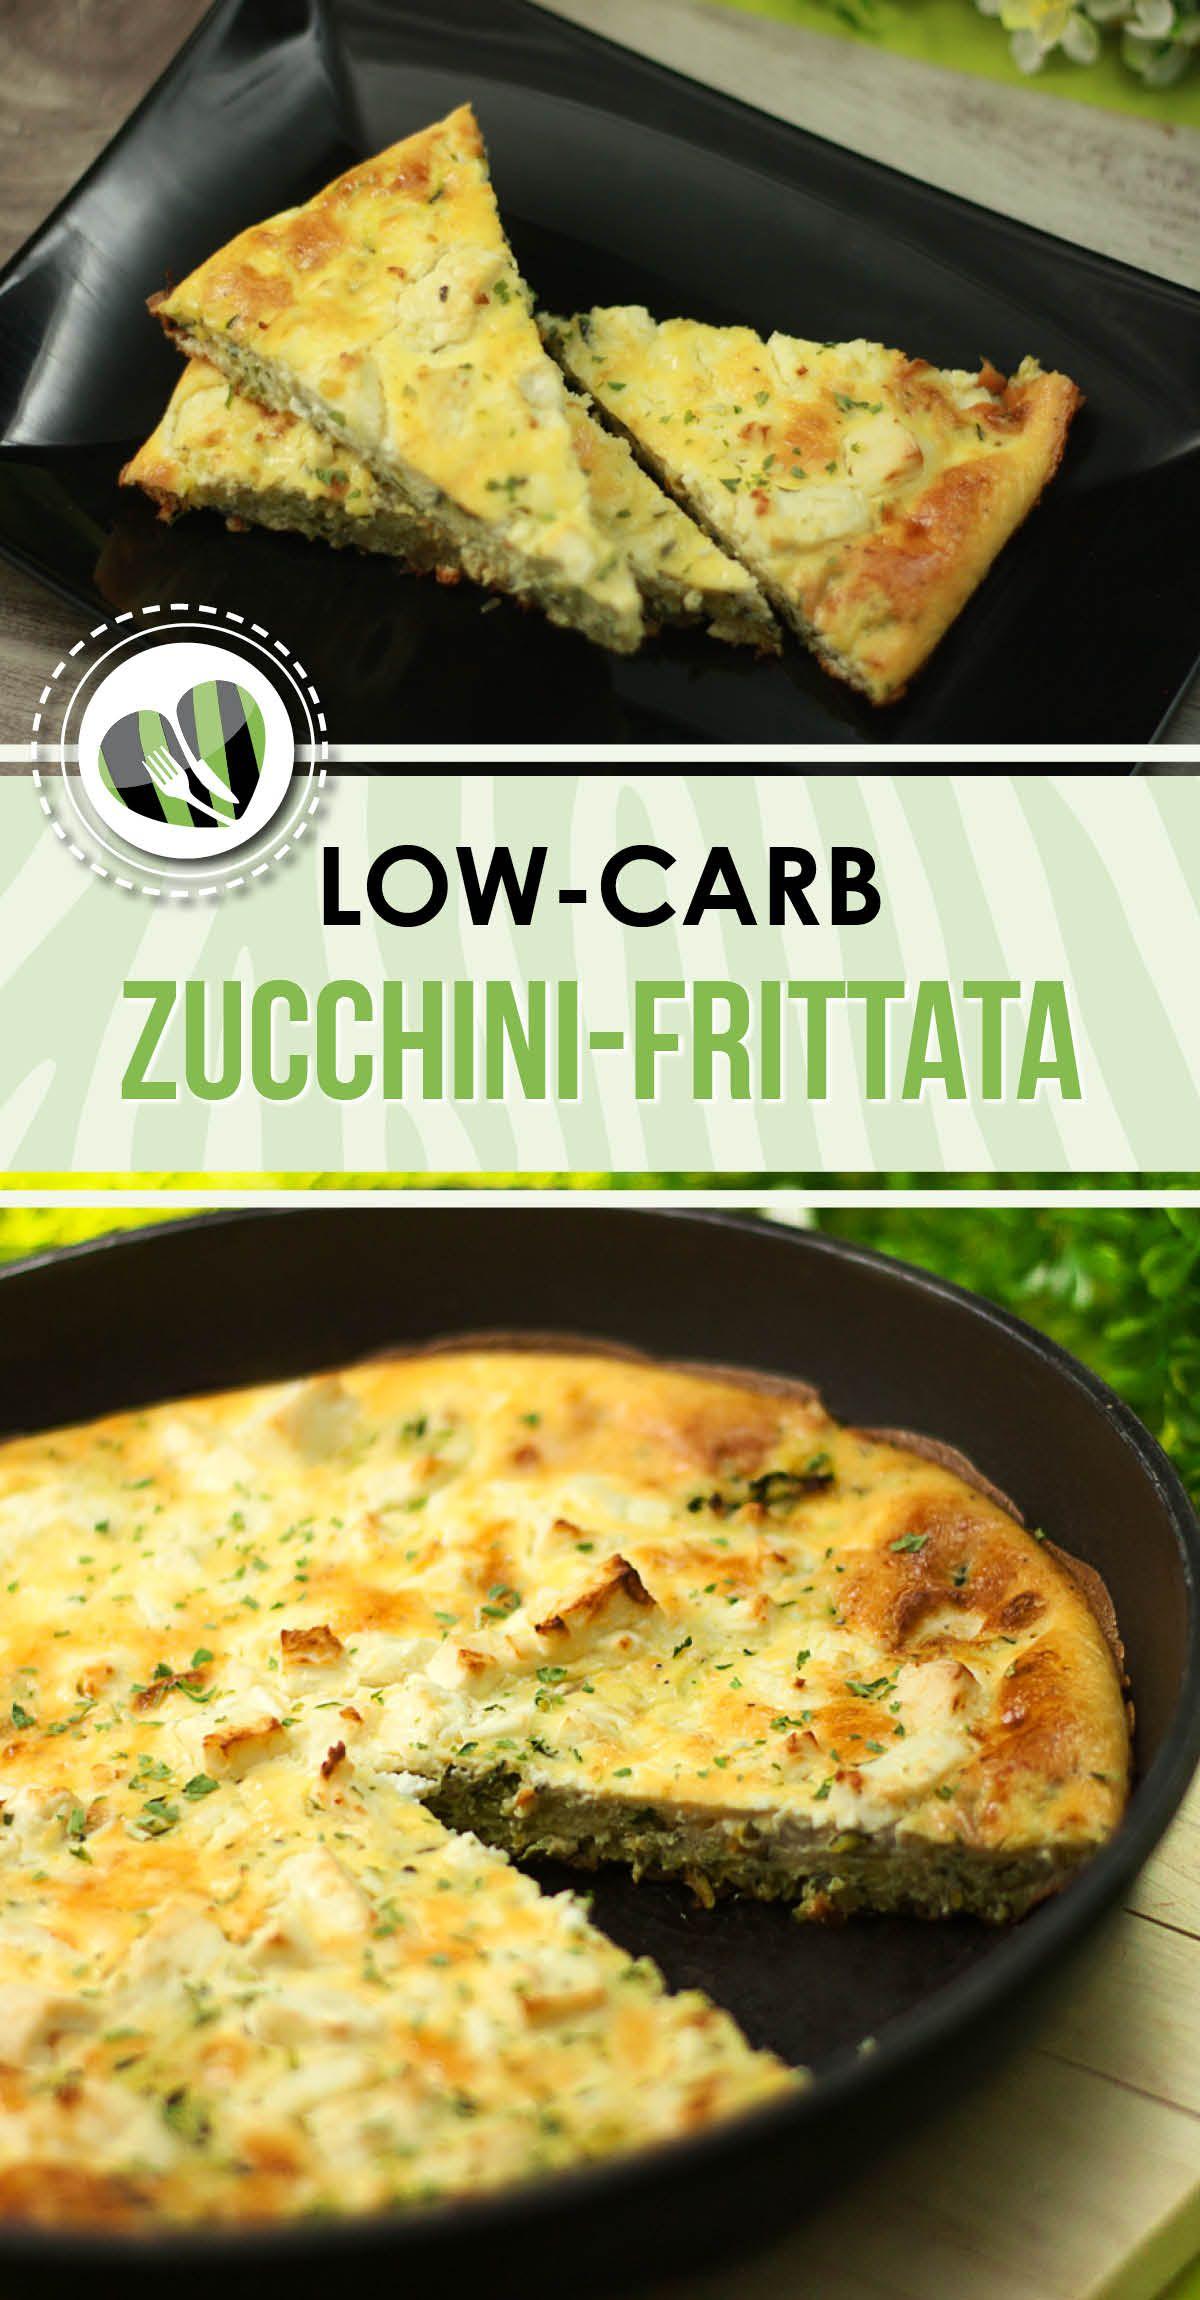 Zucchini-Frittata #lowcarbveggies